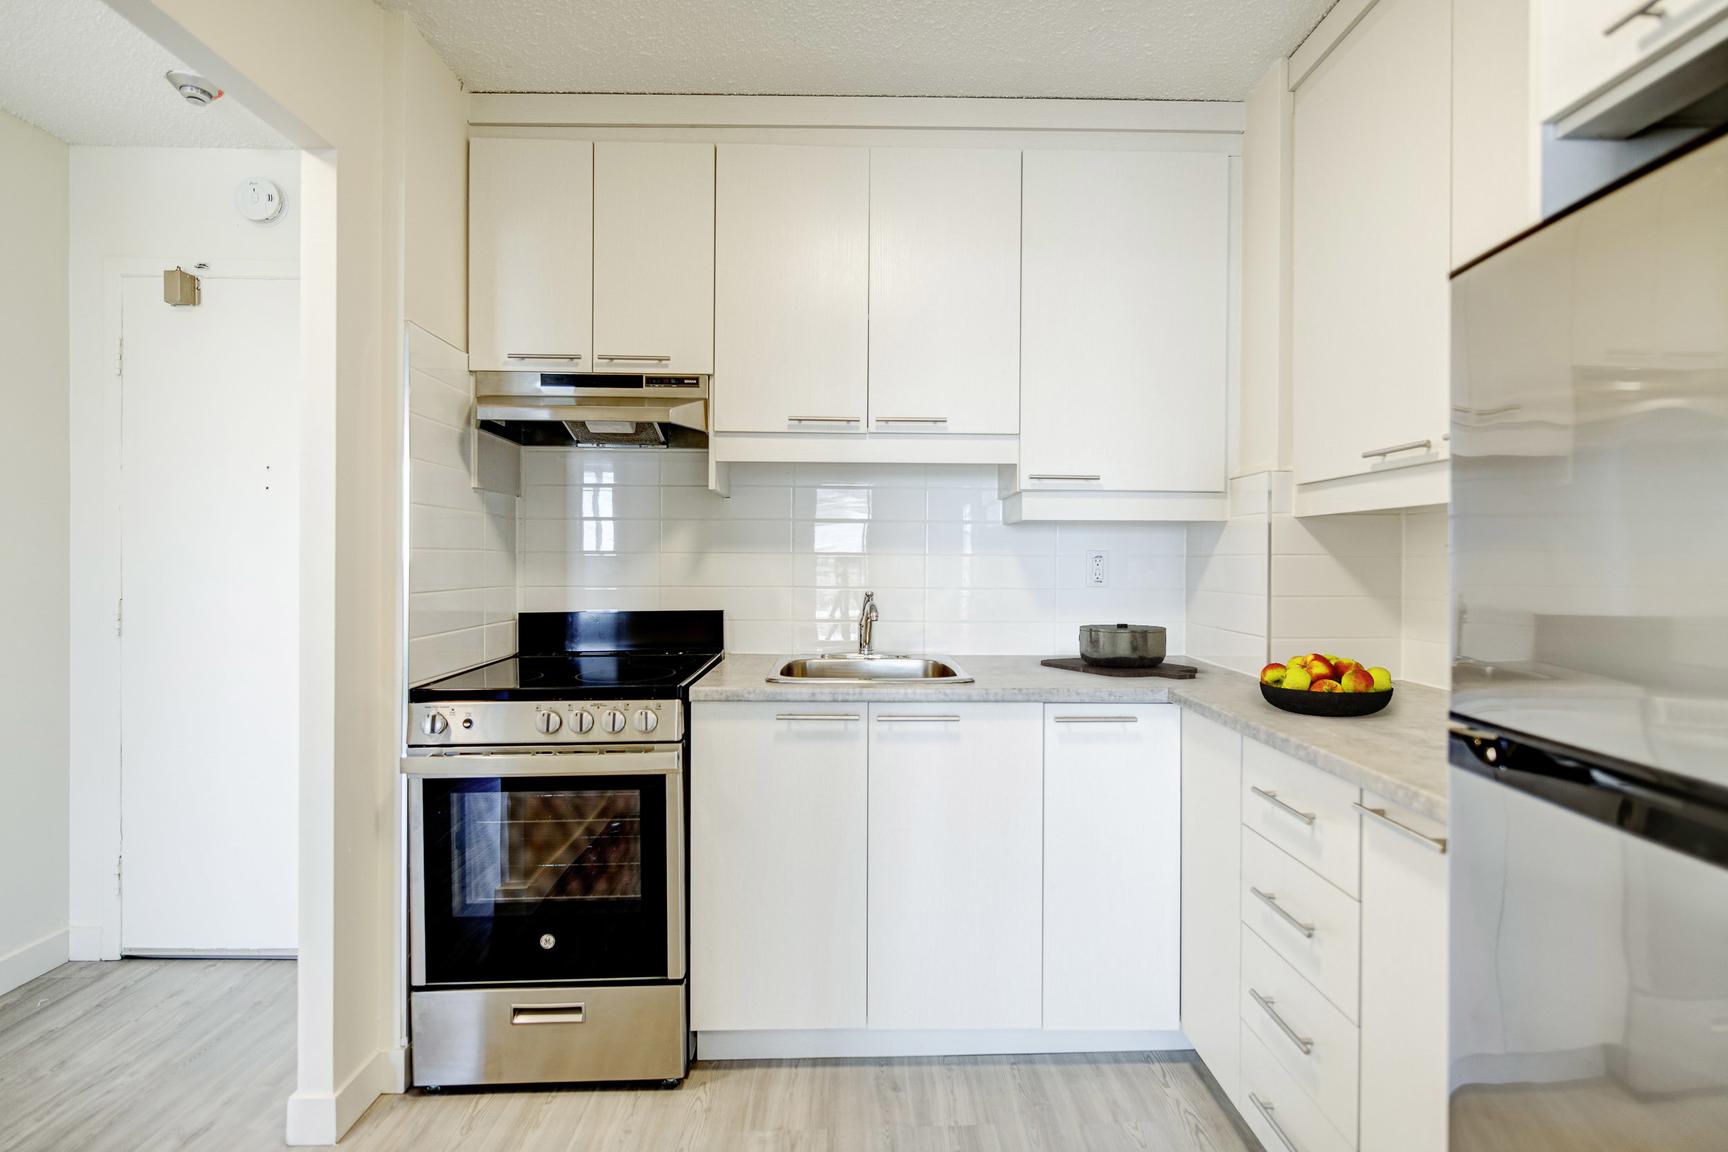 1 bedroom Apartments for rent in Laval at Le Quatre Cent - Photo 03 - RentQuebecApartments – L407184